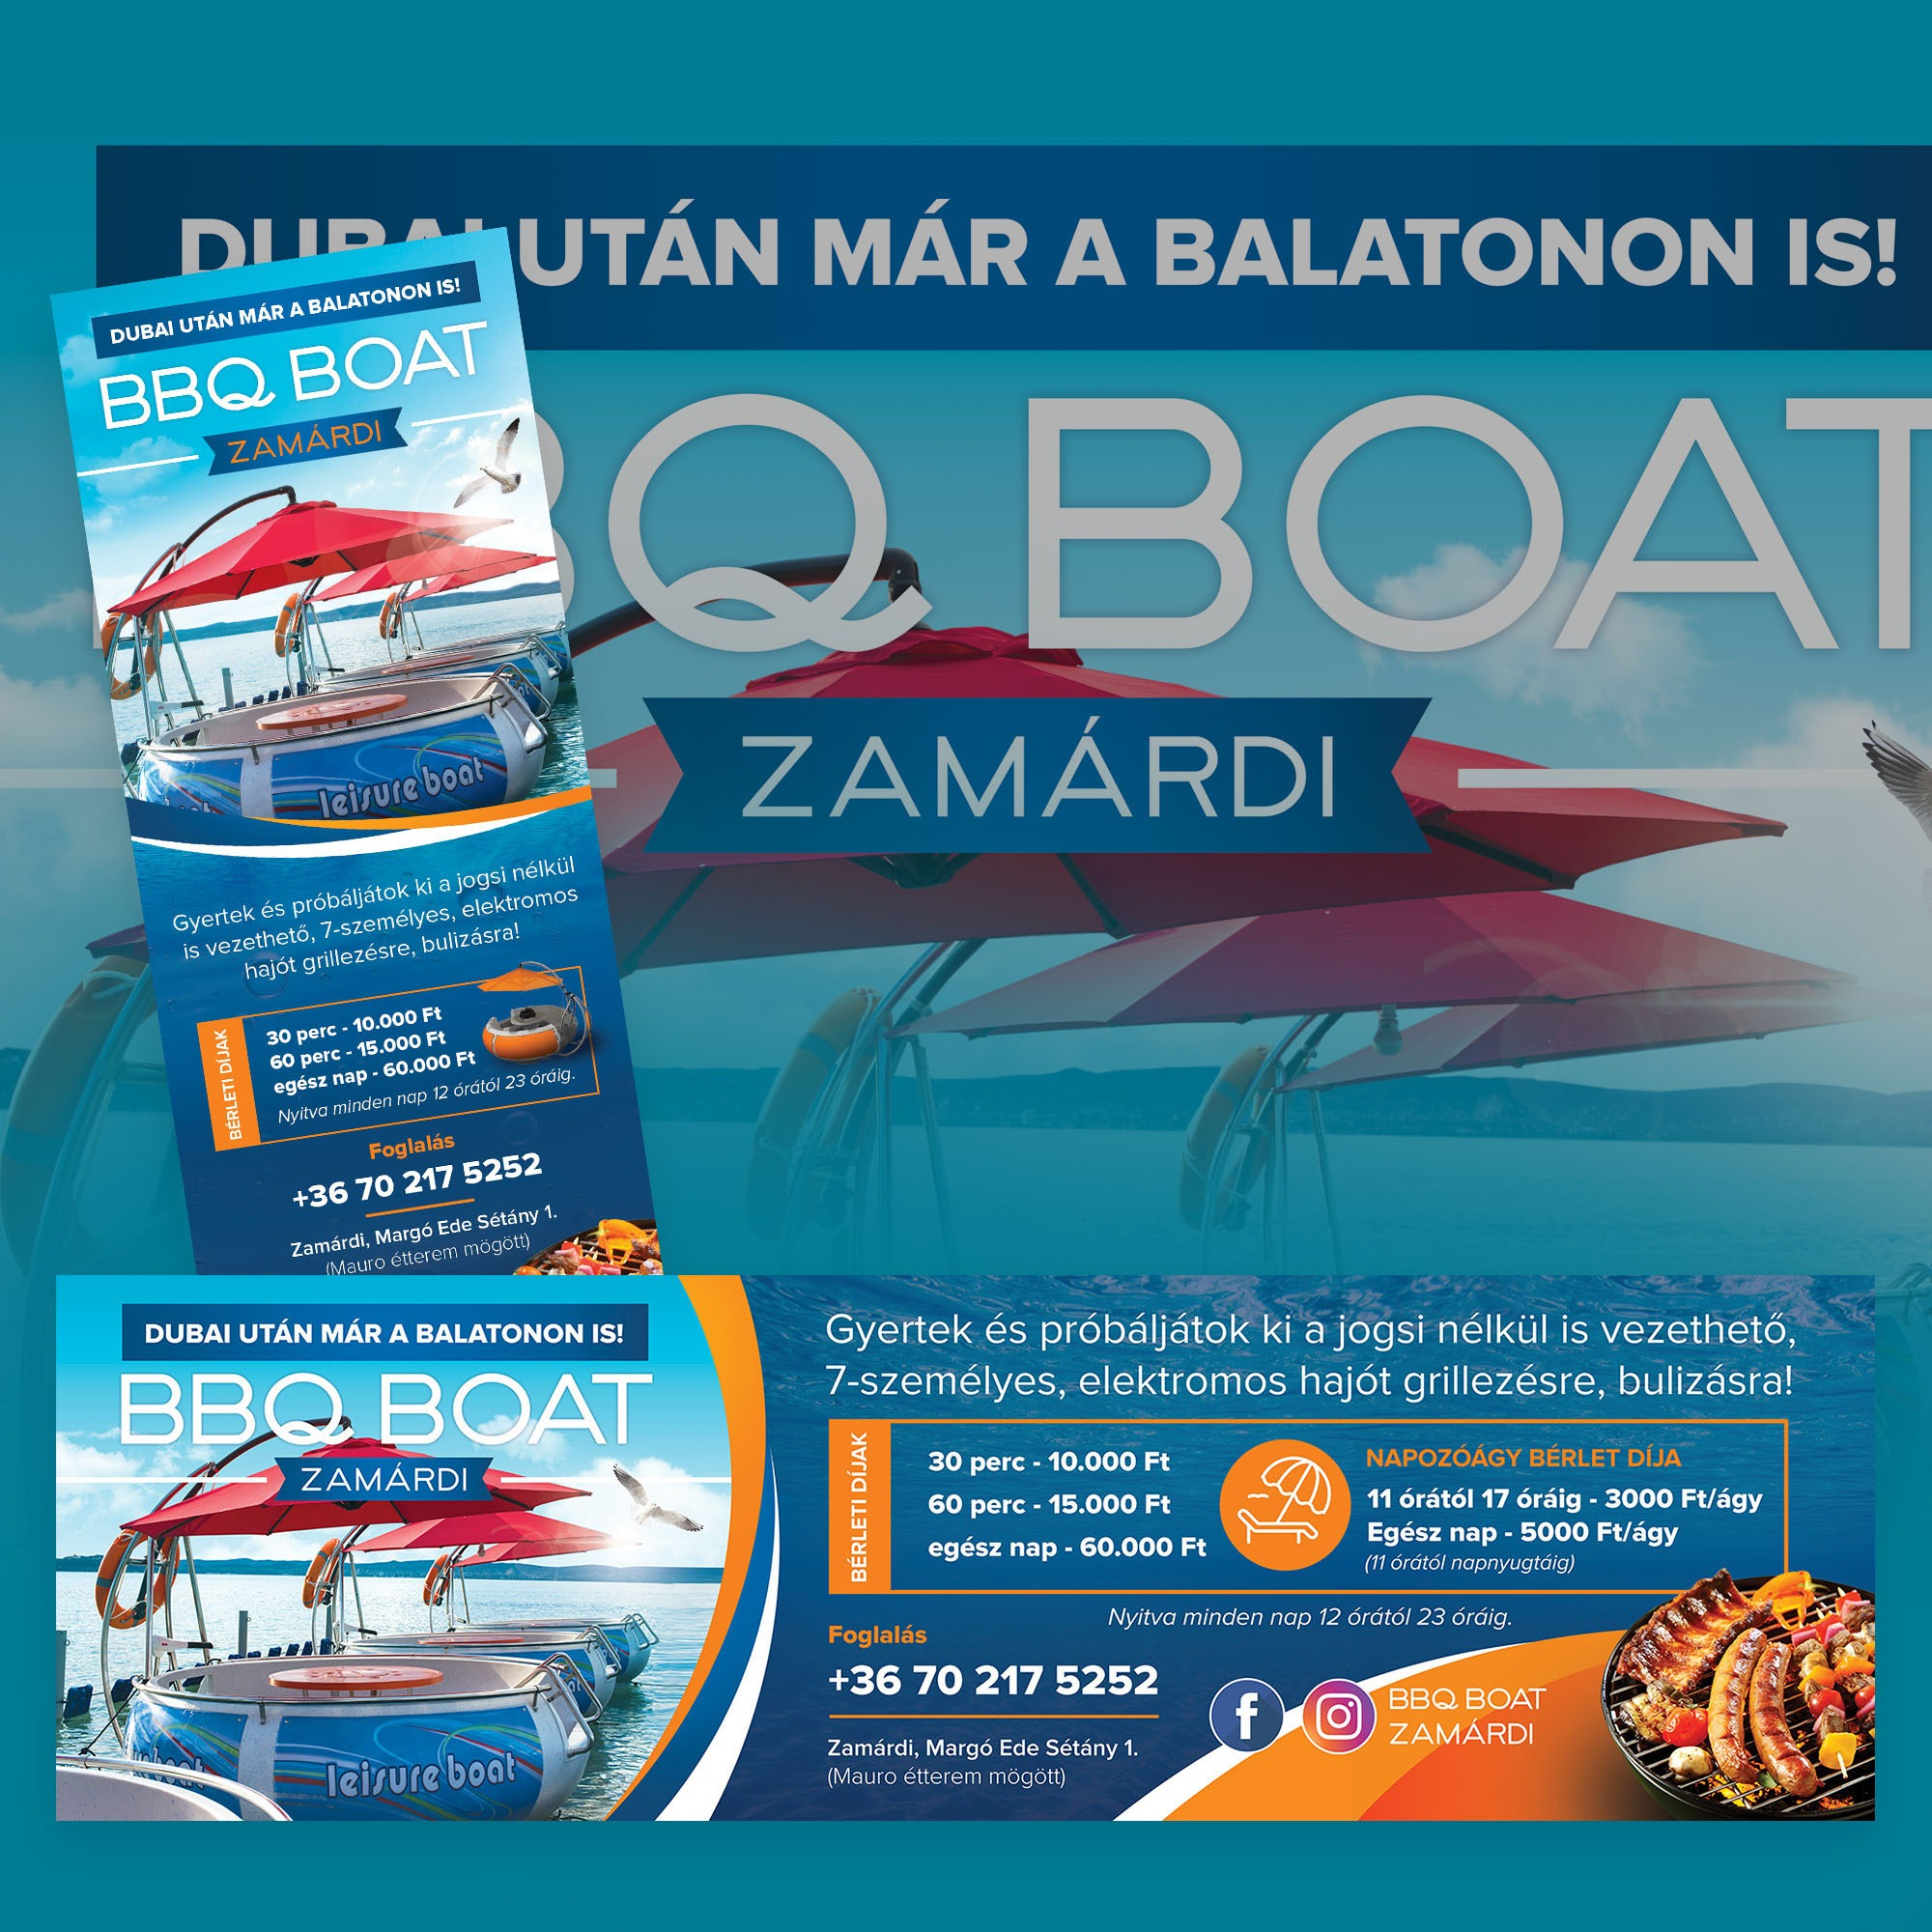 BBQ Boat Zamárdi